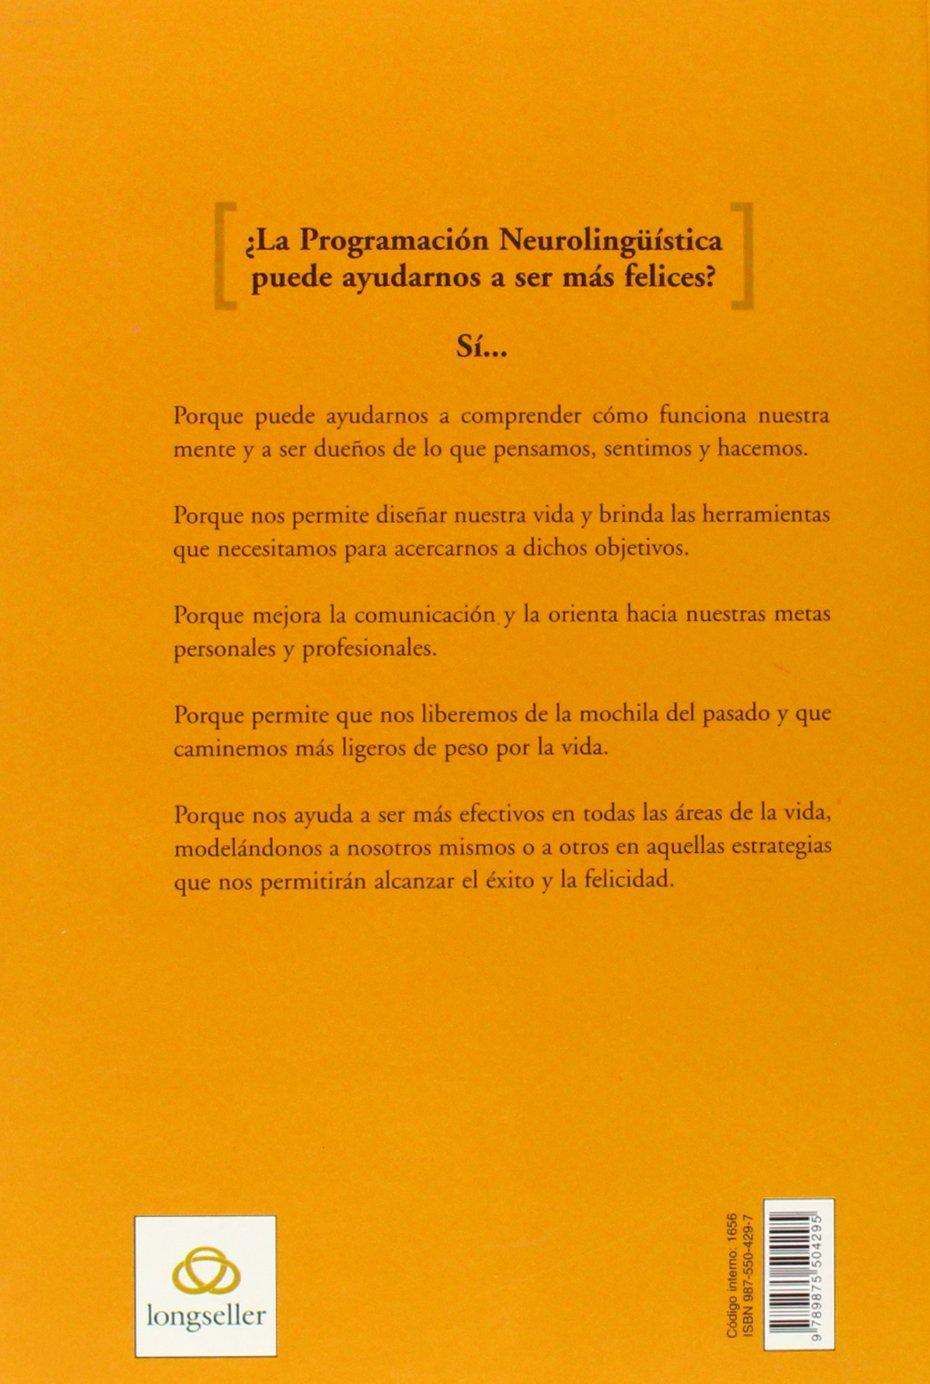 Pnl Programacion Neurolinguistica/ Pnl Neuro-linguistic Programming (Temas De Hoy) (Spanish Edition): Marcelo Actis Danna: 9789875504295: Amazon.com: Books